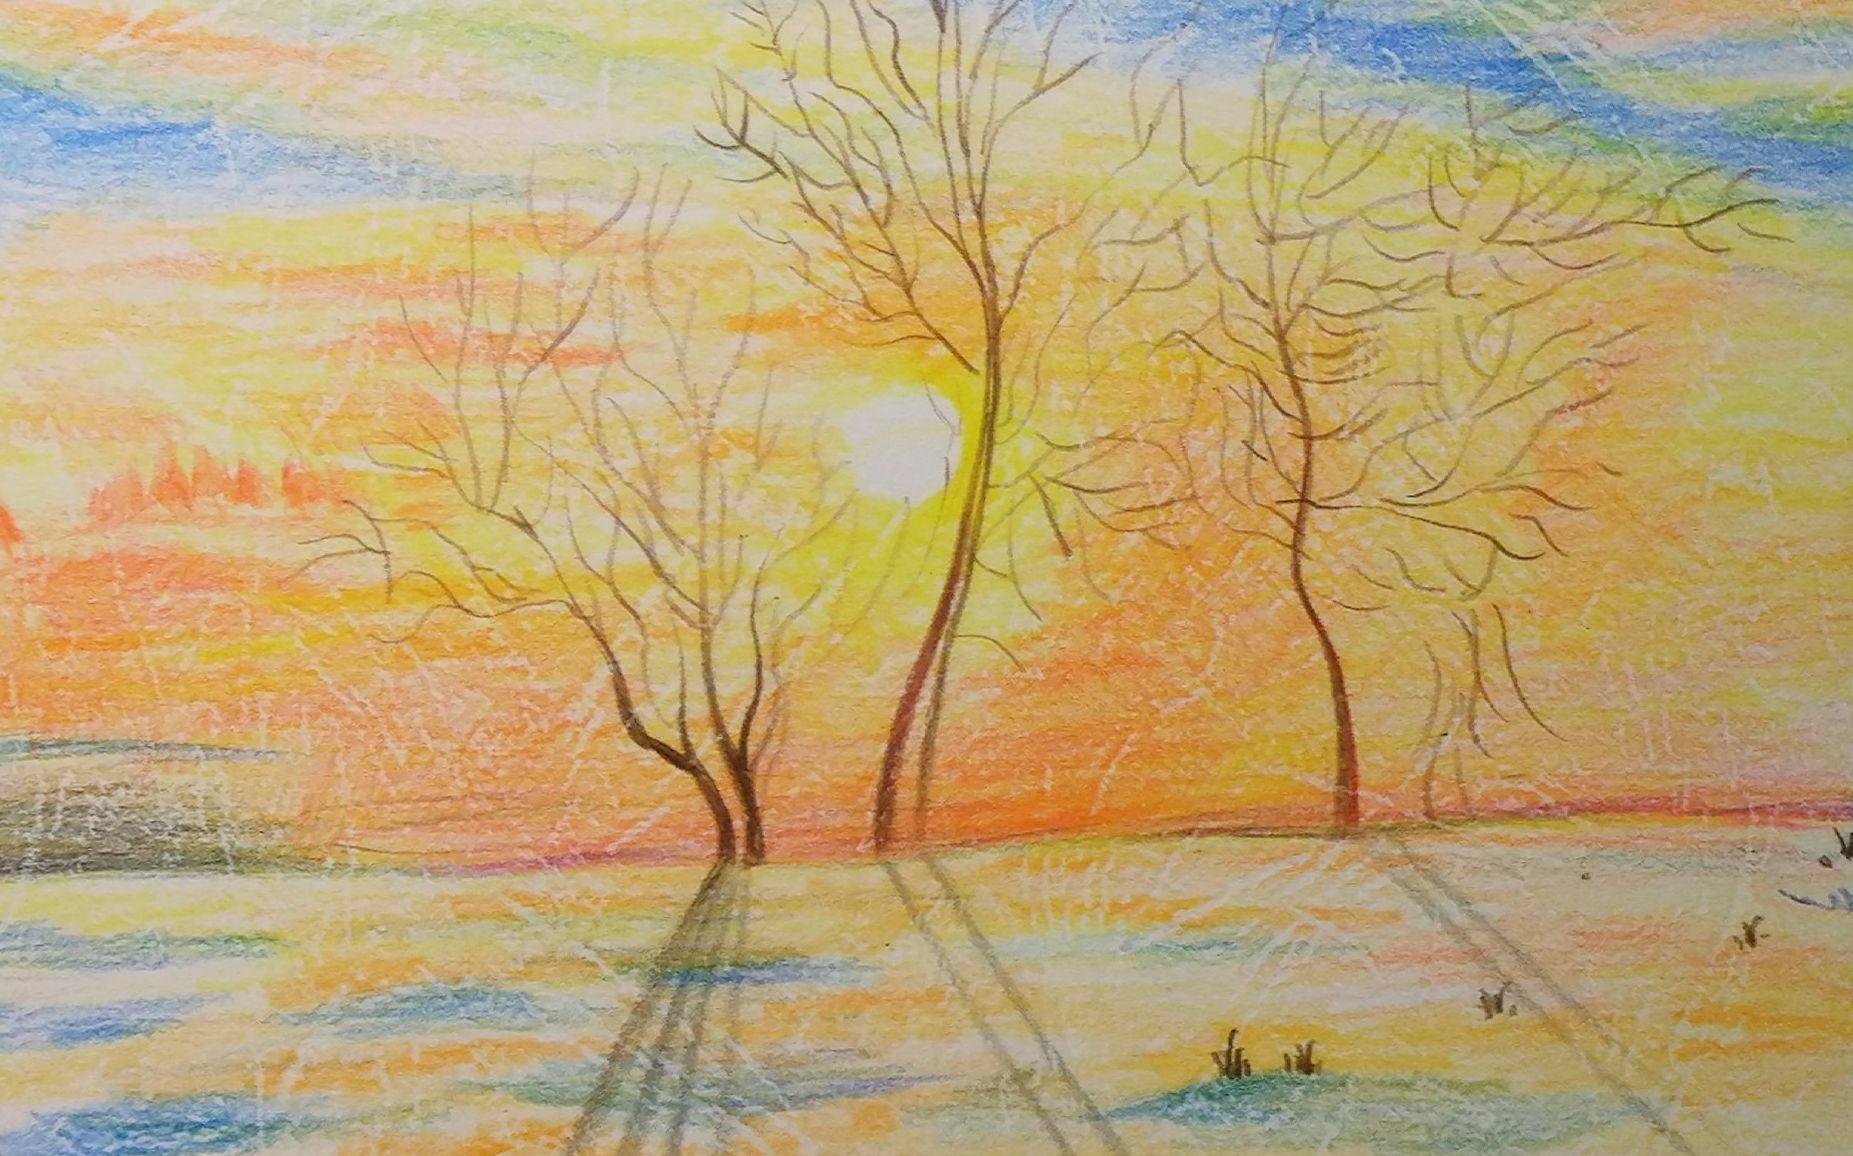 油性彩铅 风景画教程_【彩铅】日常向风景画 '余晖'_哔哩哔哩 (゜-゜)つロ 干杯~-bilibili